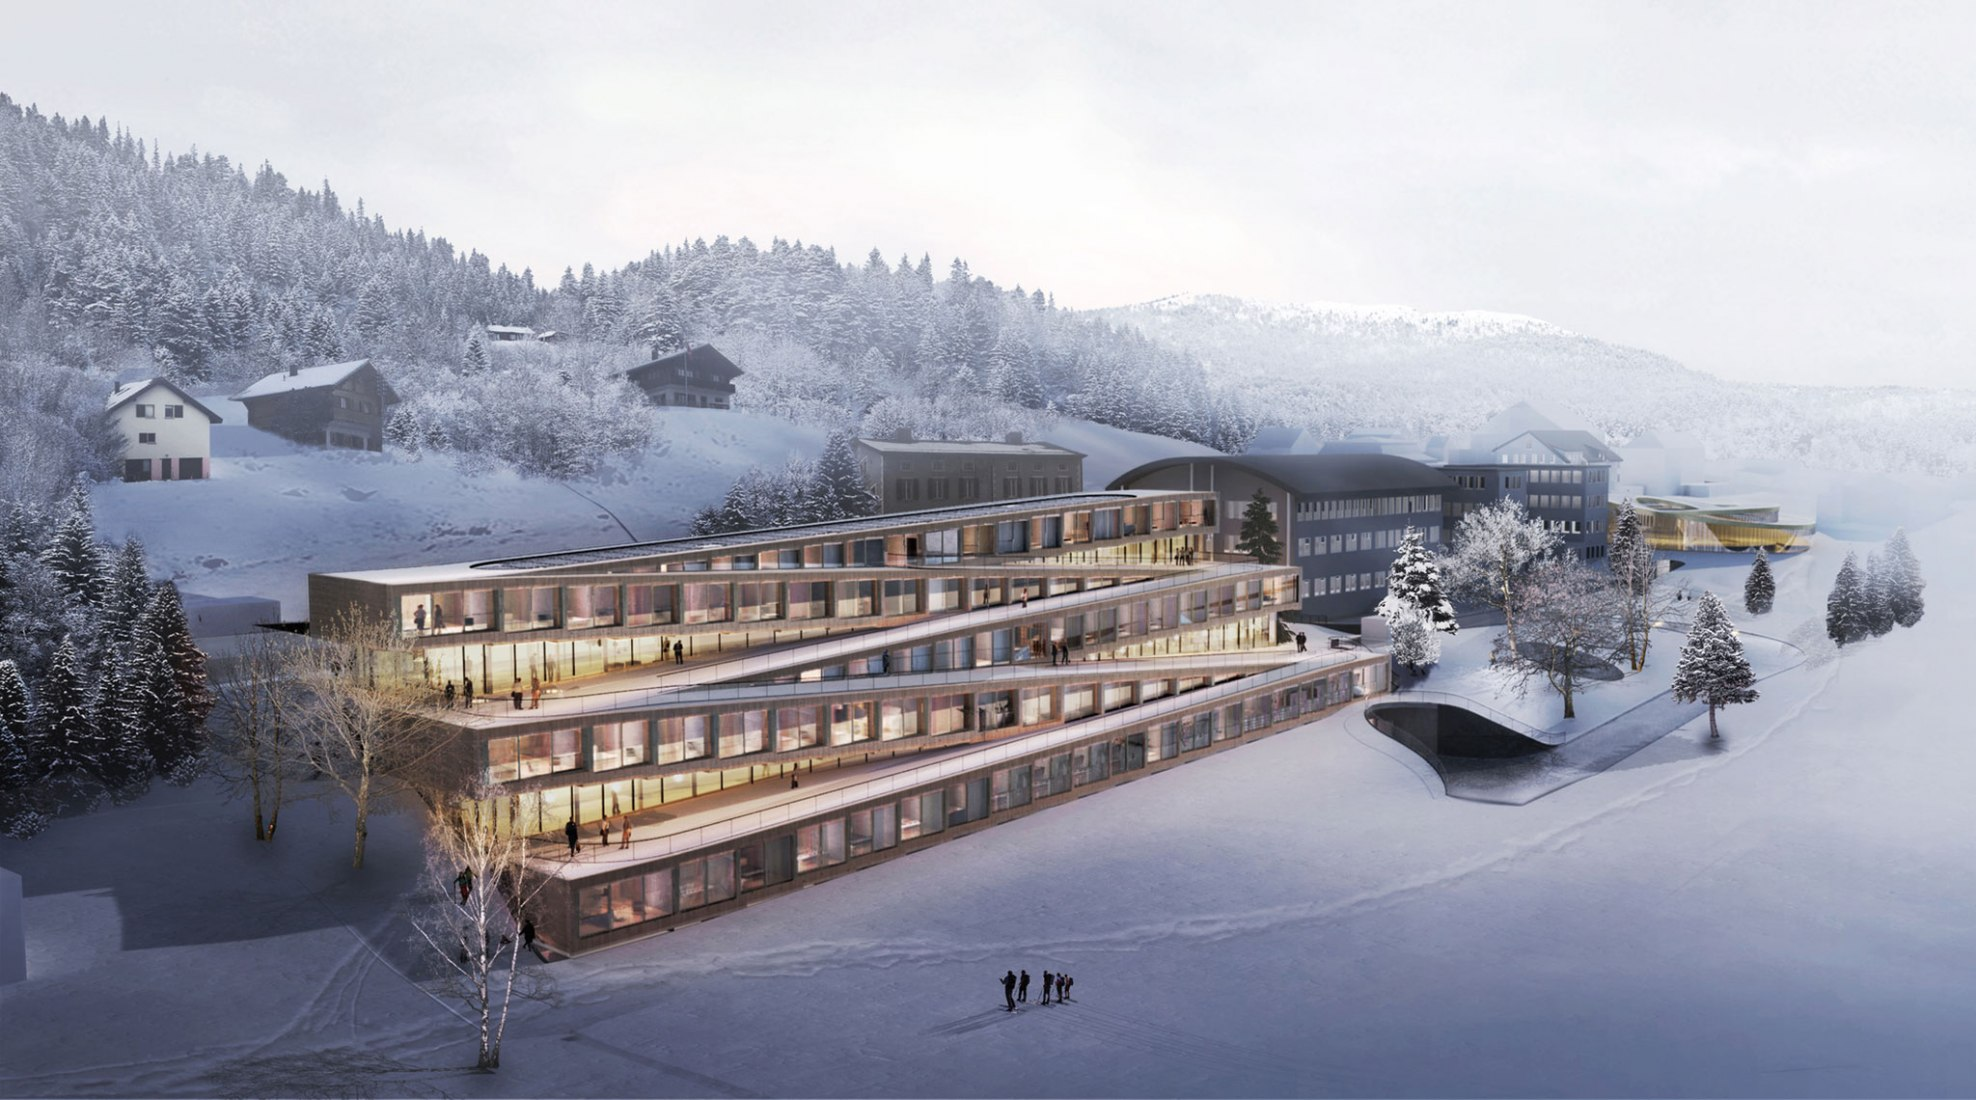 Rendering. Zig-Zag Ski Hotel by BIG-Bjarke Ingels Group. Courtesy of BIG-Bjarke Ingels Group